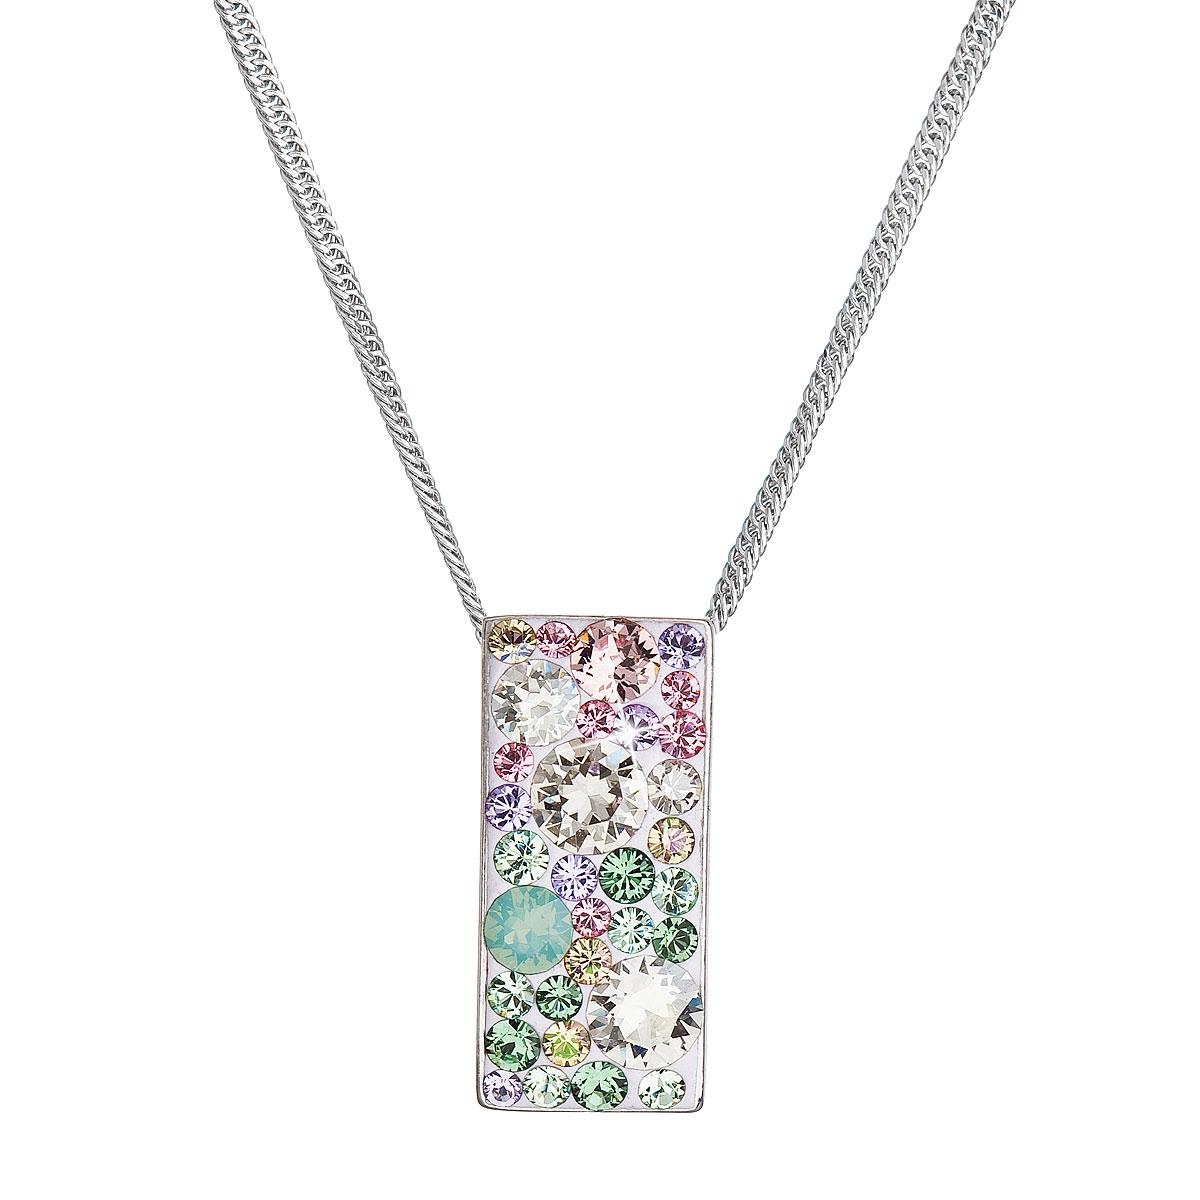 Stříbrný náhrdelník se Swarovski krystaly, Sakura EG4257-SK